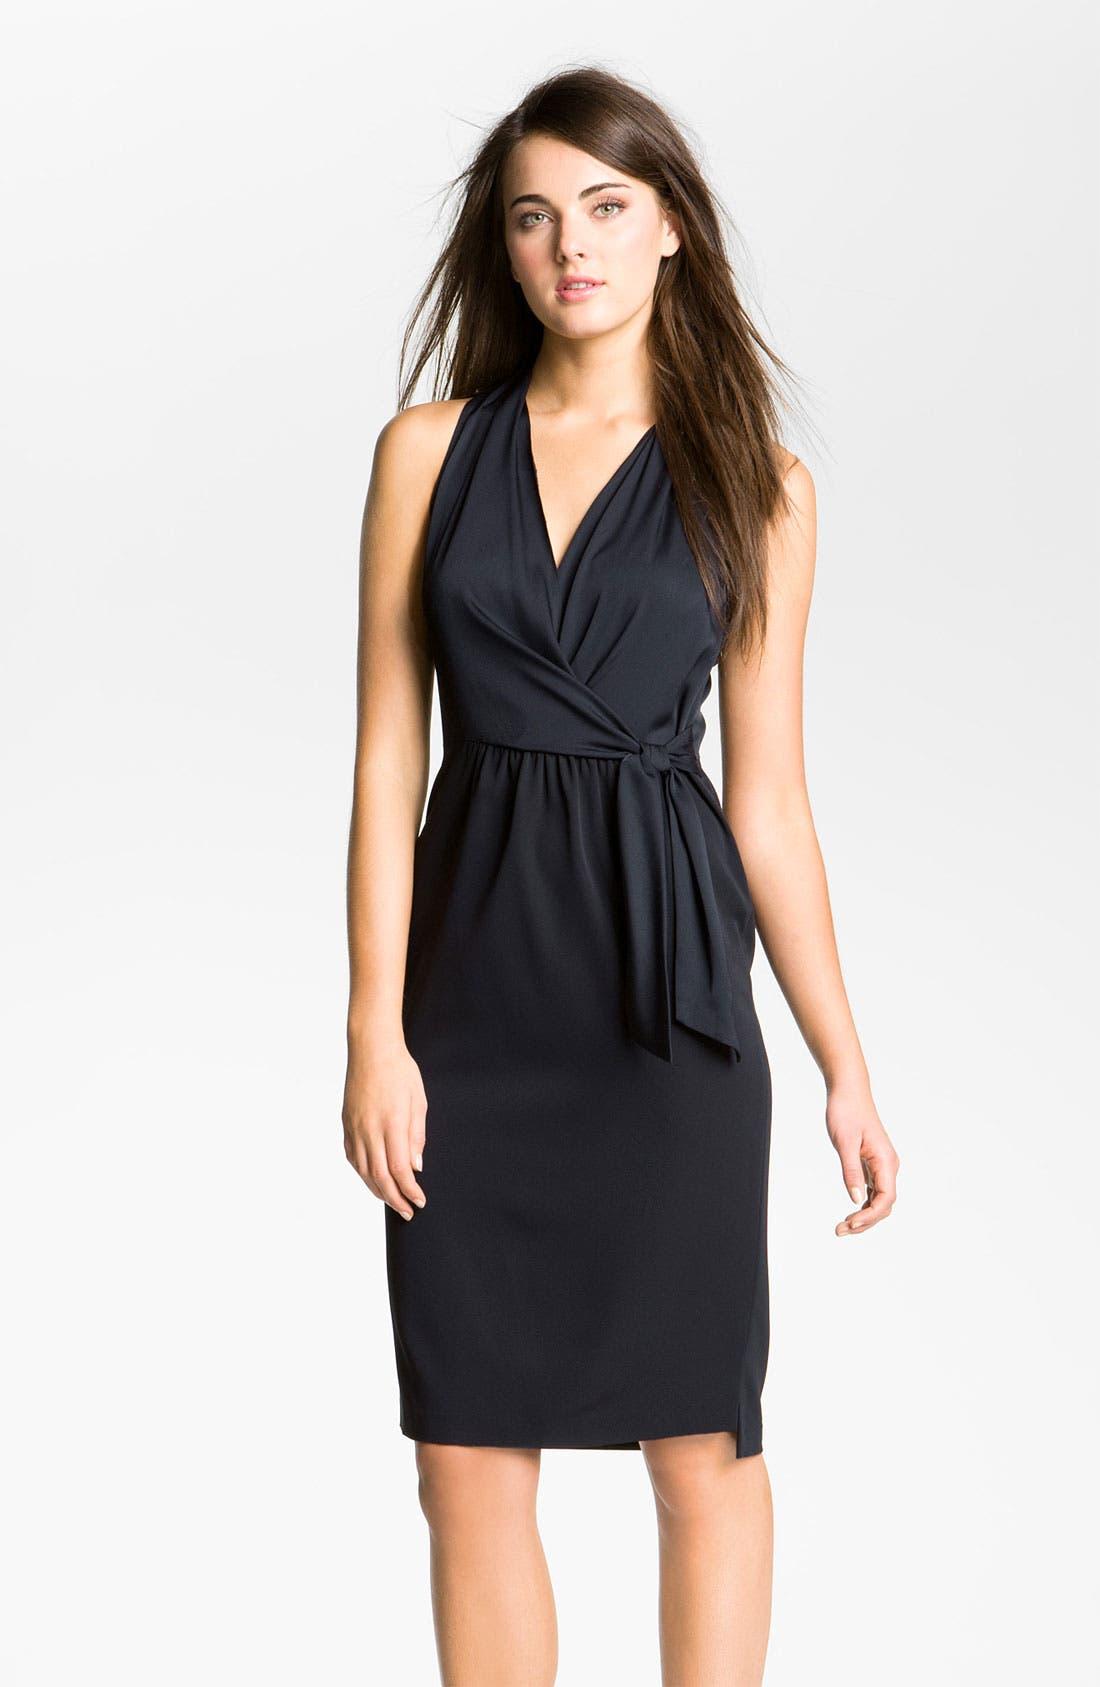 Main Image - Elie Tahari 'Savannah' Sleeveless Crêpe de Chine Faux Wrap Dress